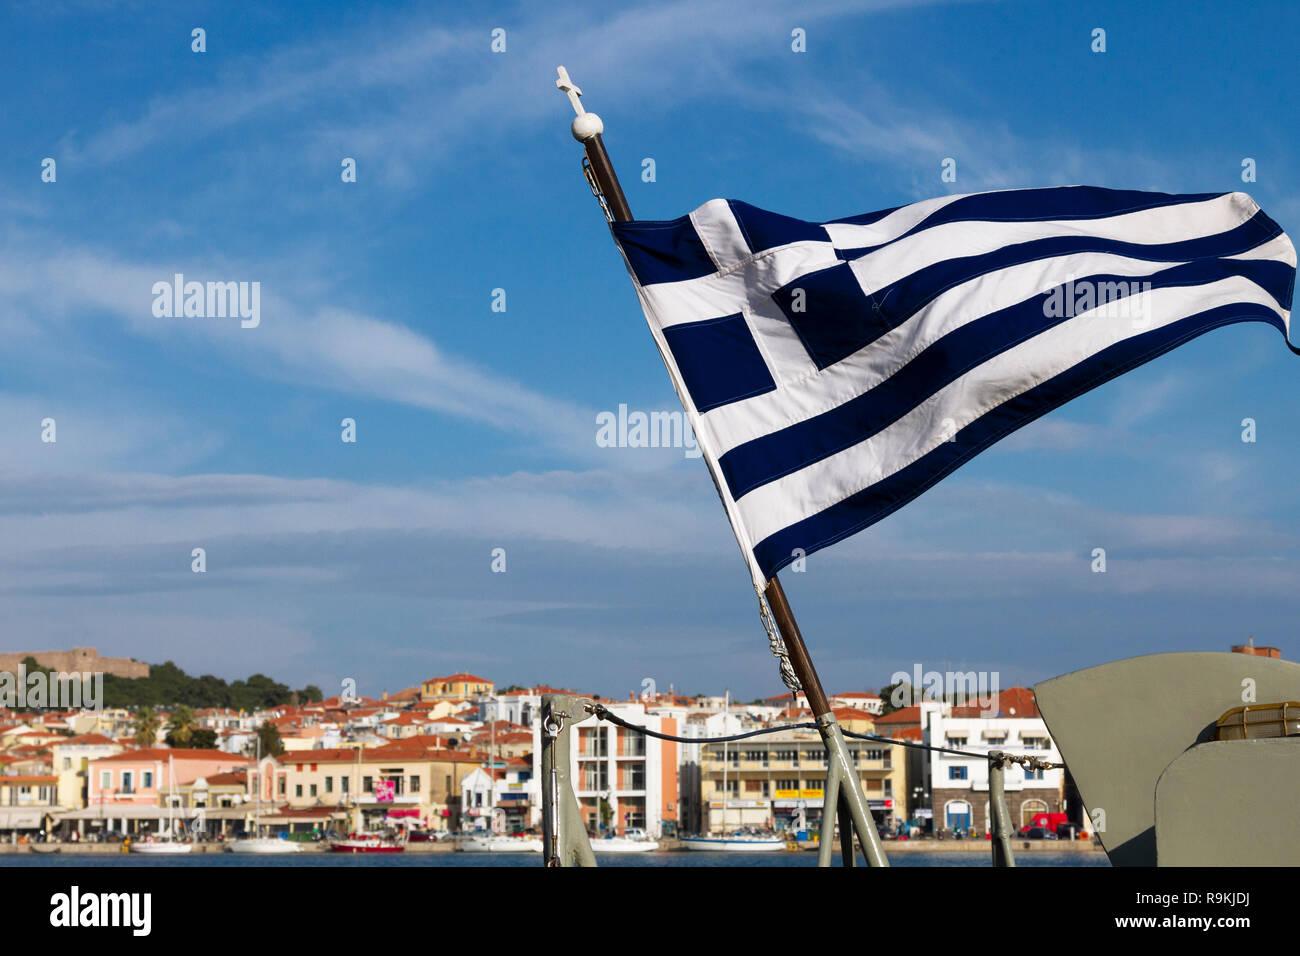 Flag of Greece at the port of Mytilene, in Lesvos island, Greece. - Stock Image